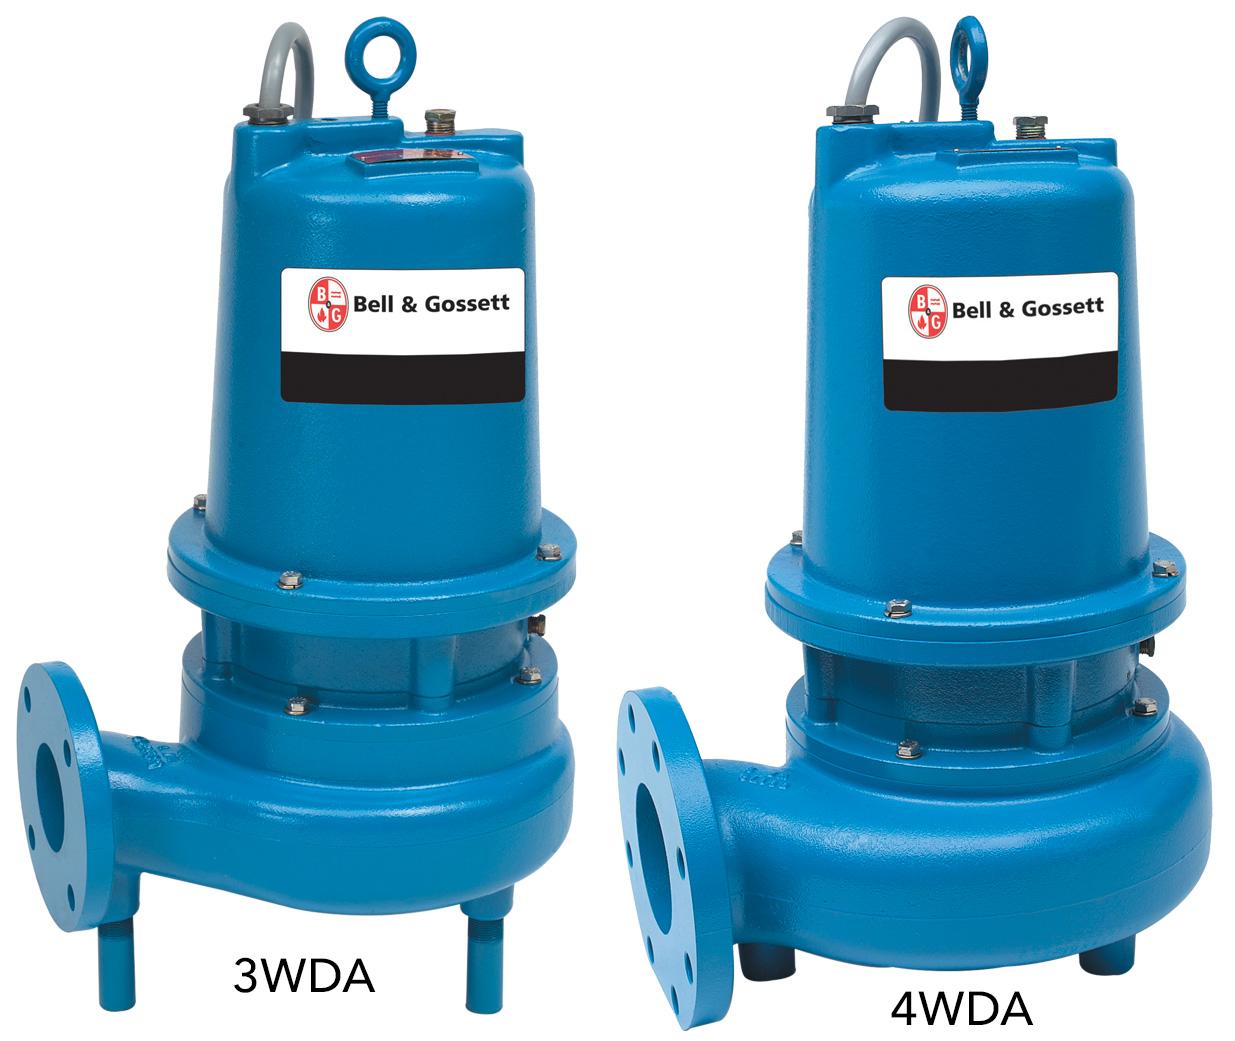 Bell and Gossett 3WDA-4WDA submersible pumps